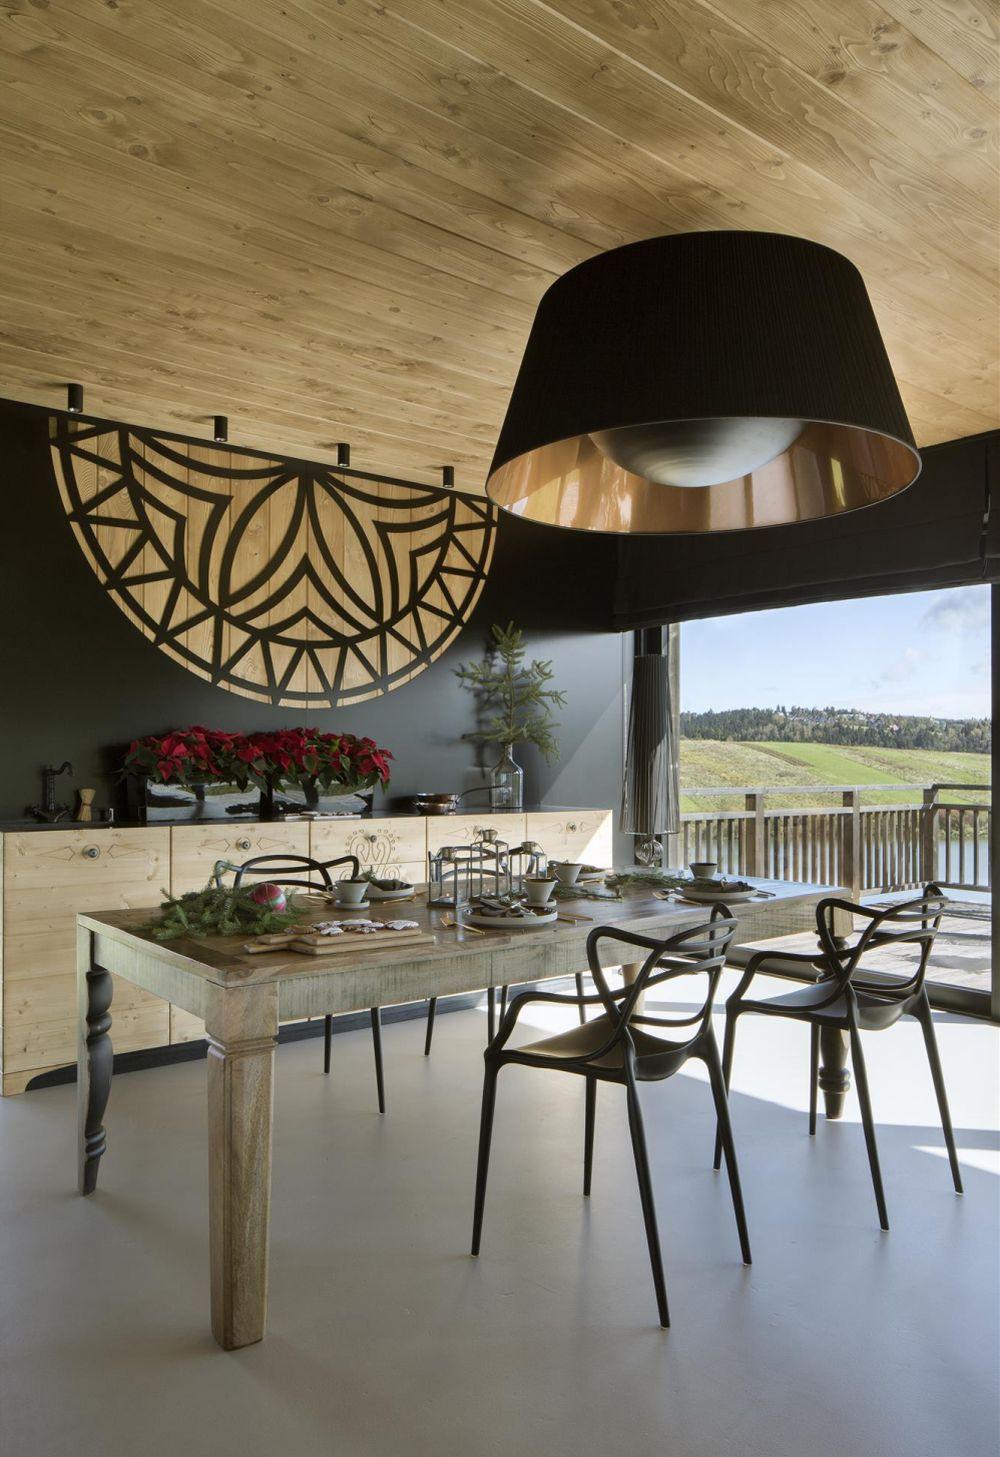 adelaparvu.com despre casa contemporana inspirata de arhitectura traditionala, Design Hola Design Studio, arhitectura Exterior, Foto Yassen Hristov (13)